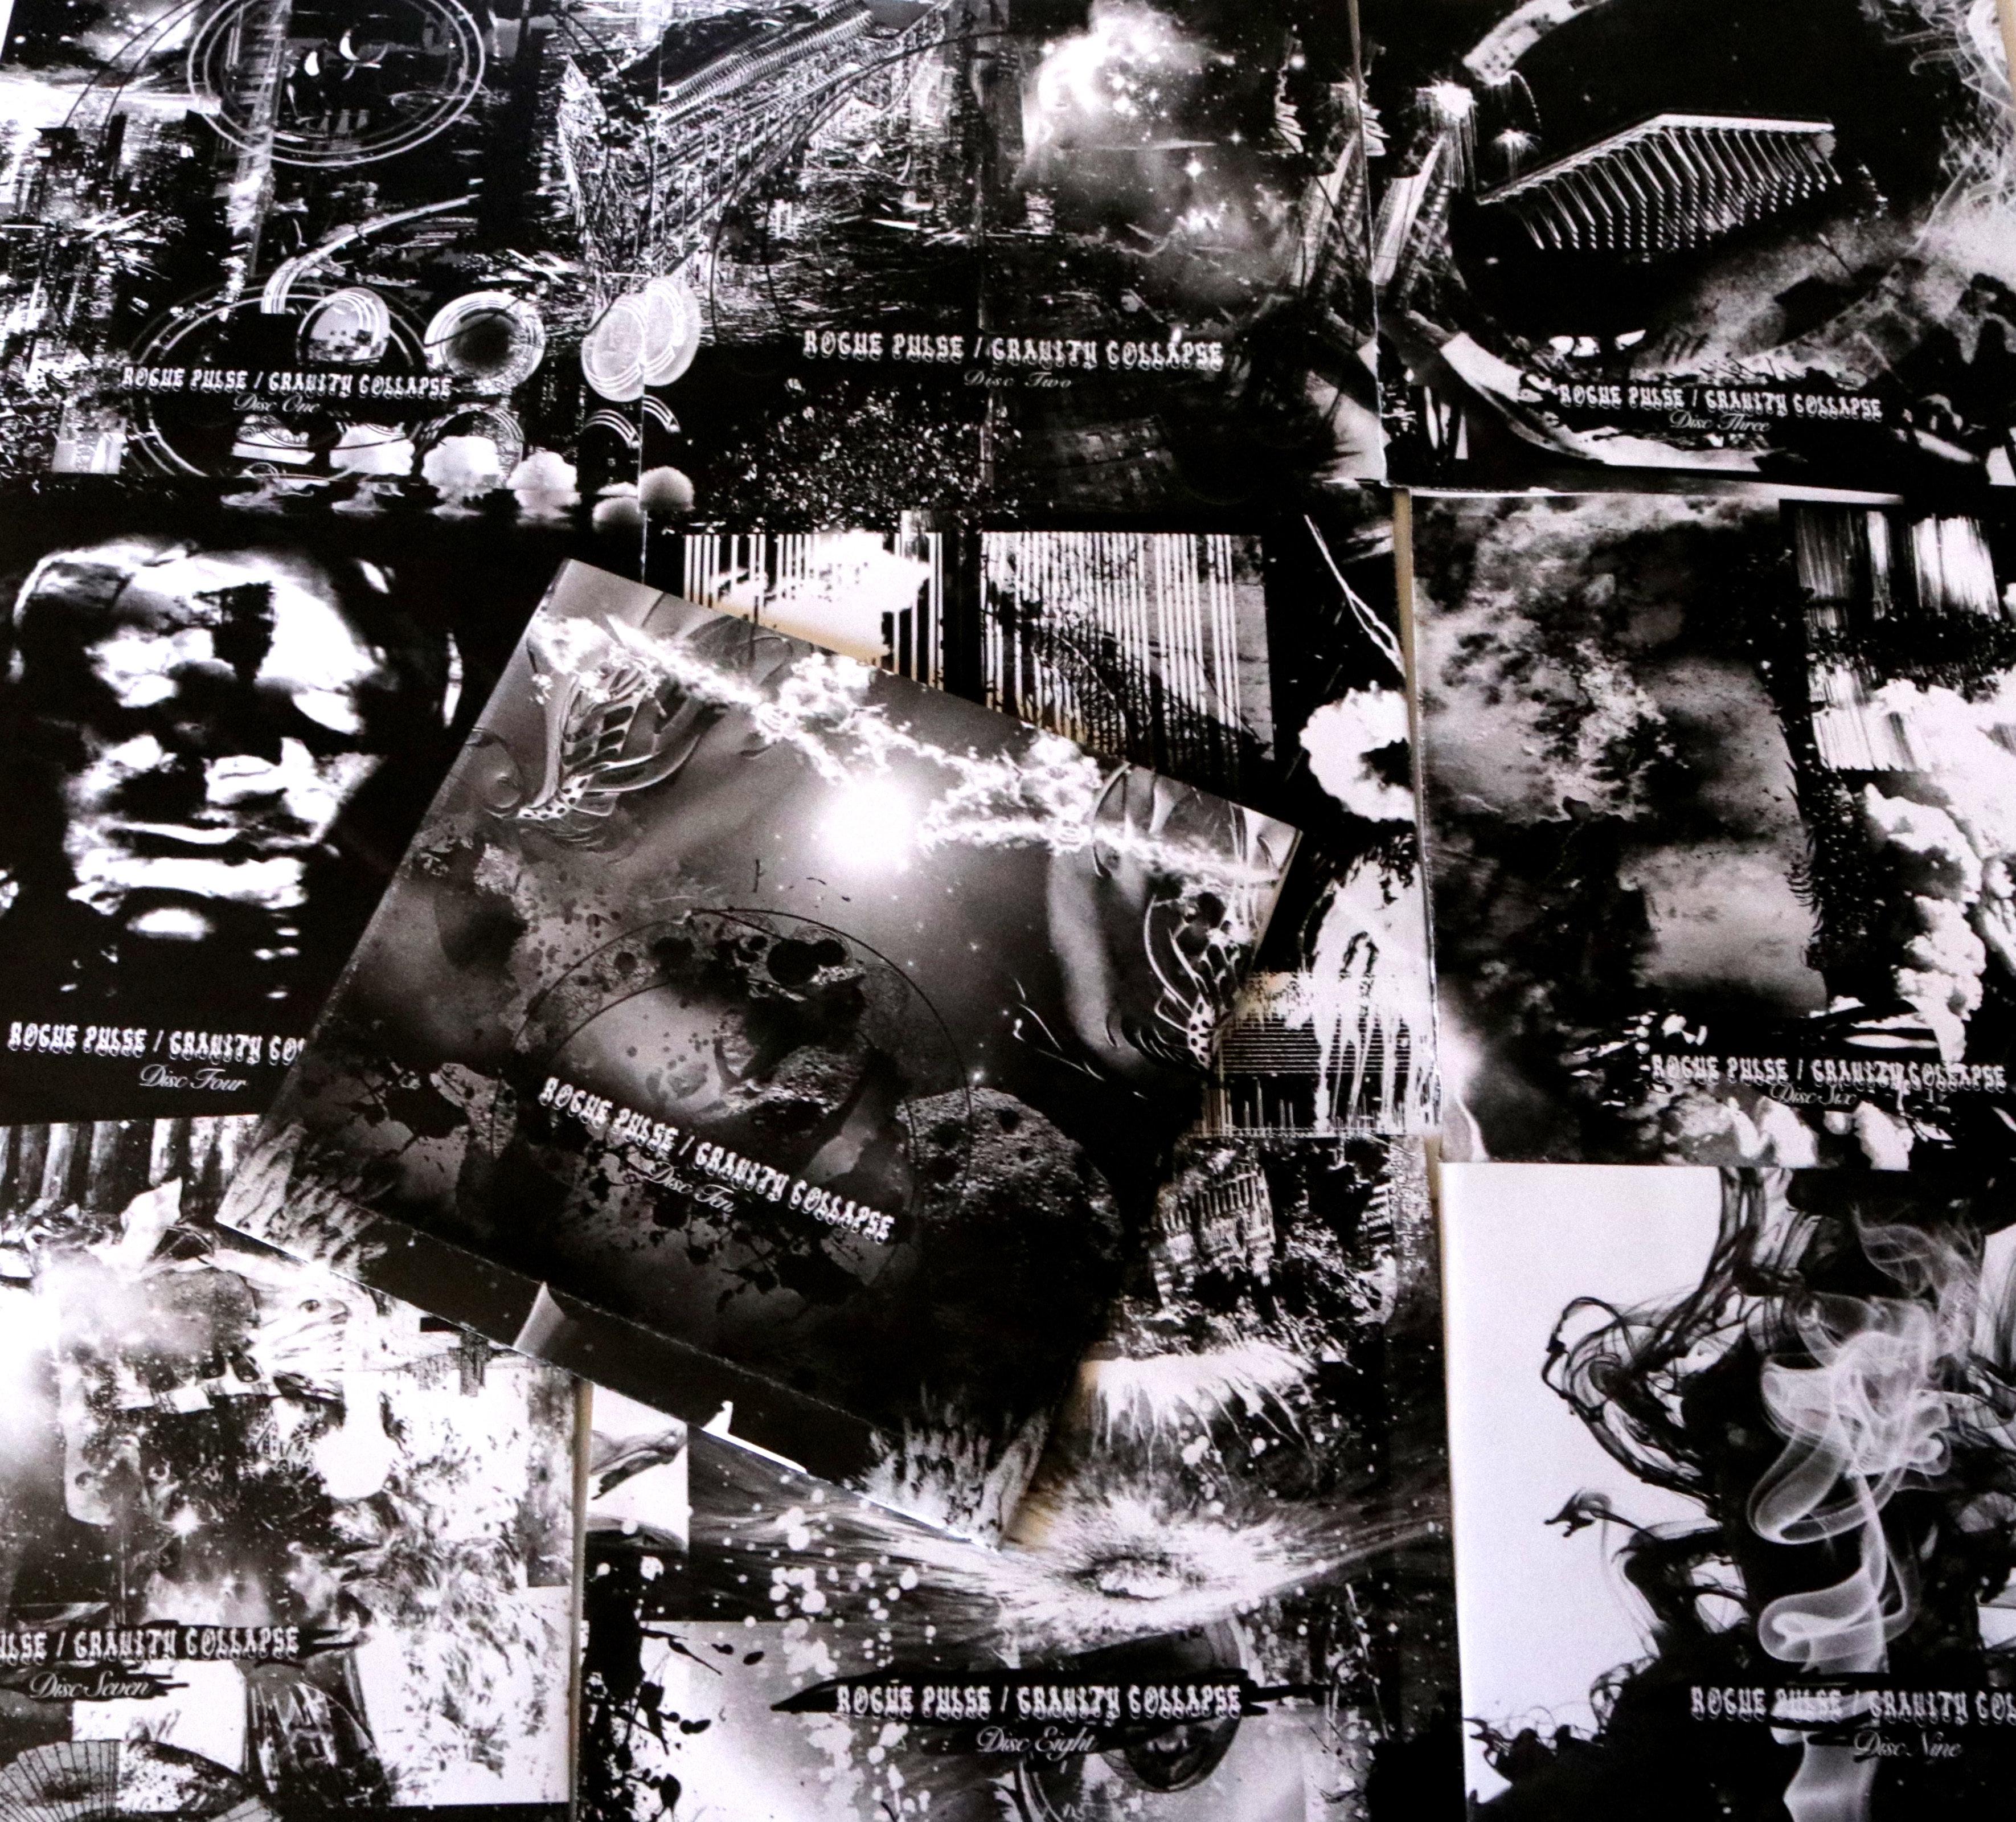 ROGUE PULSE  / GRAVITY COLLAPSE  Ten Disc  Artist Edition Boxset